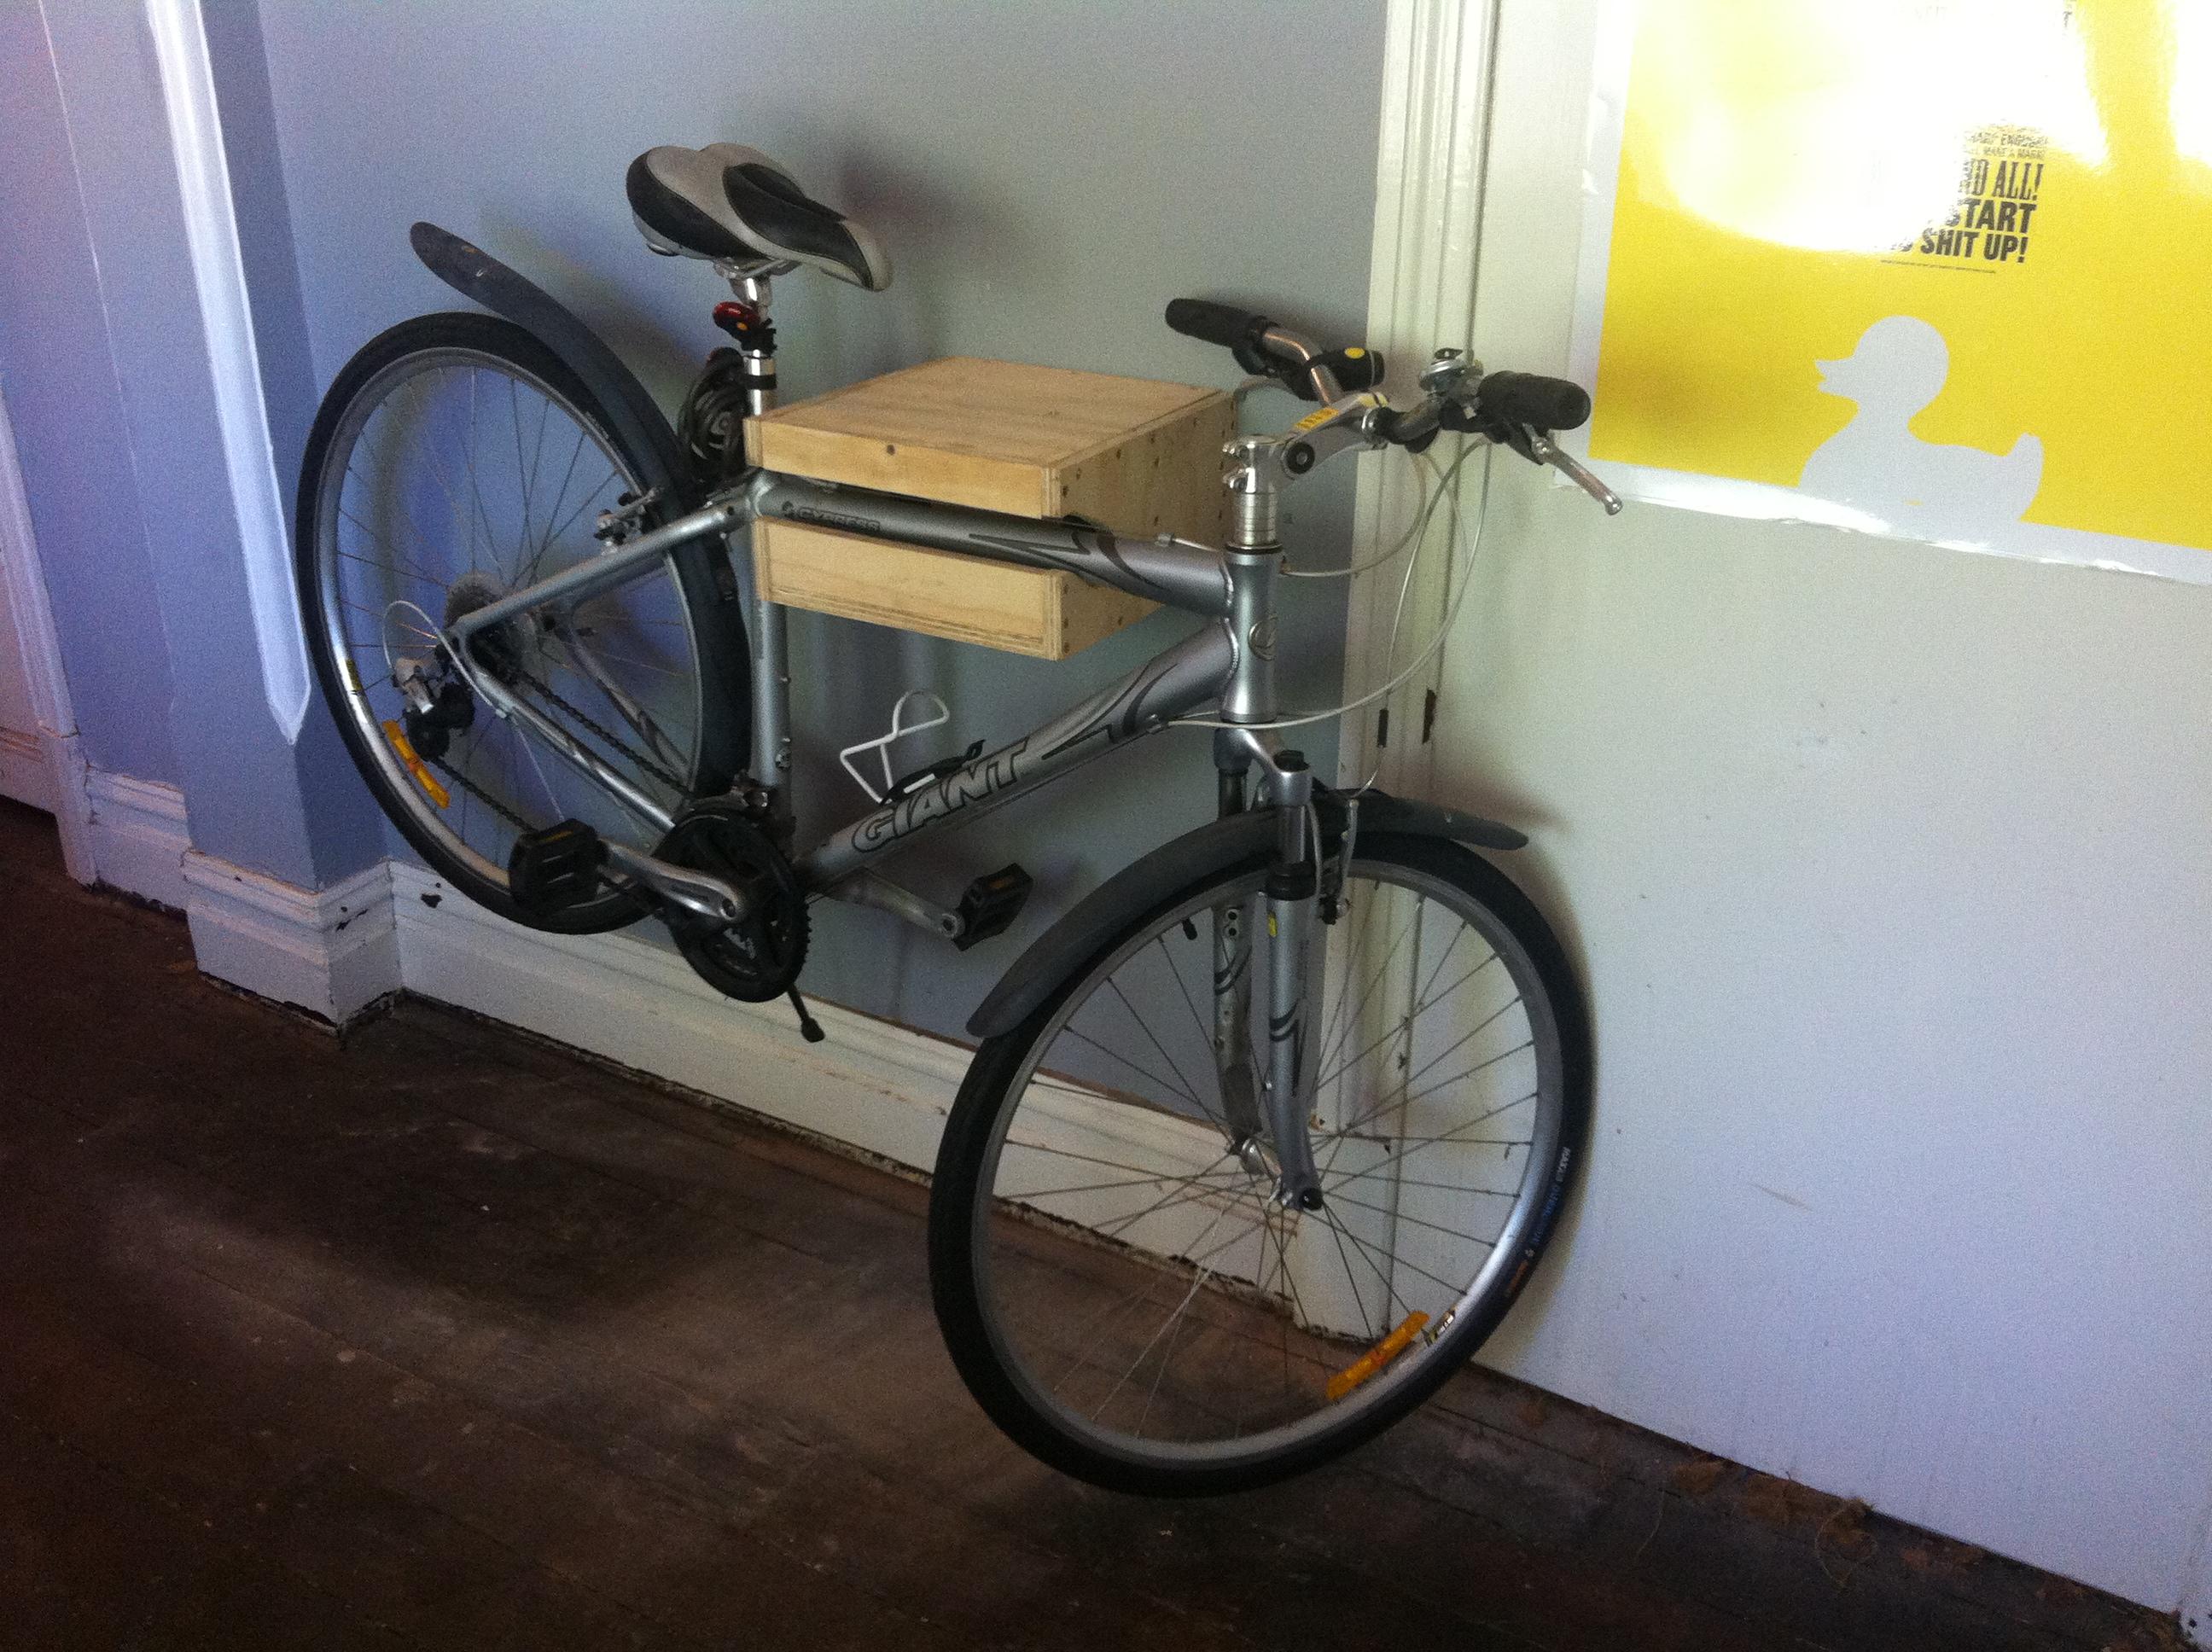 Bike Hanger Shelf